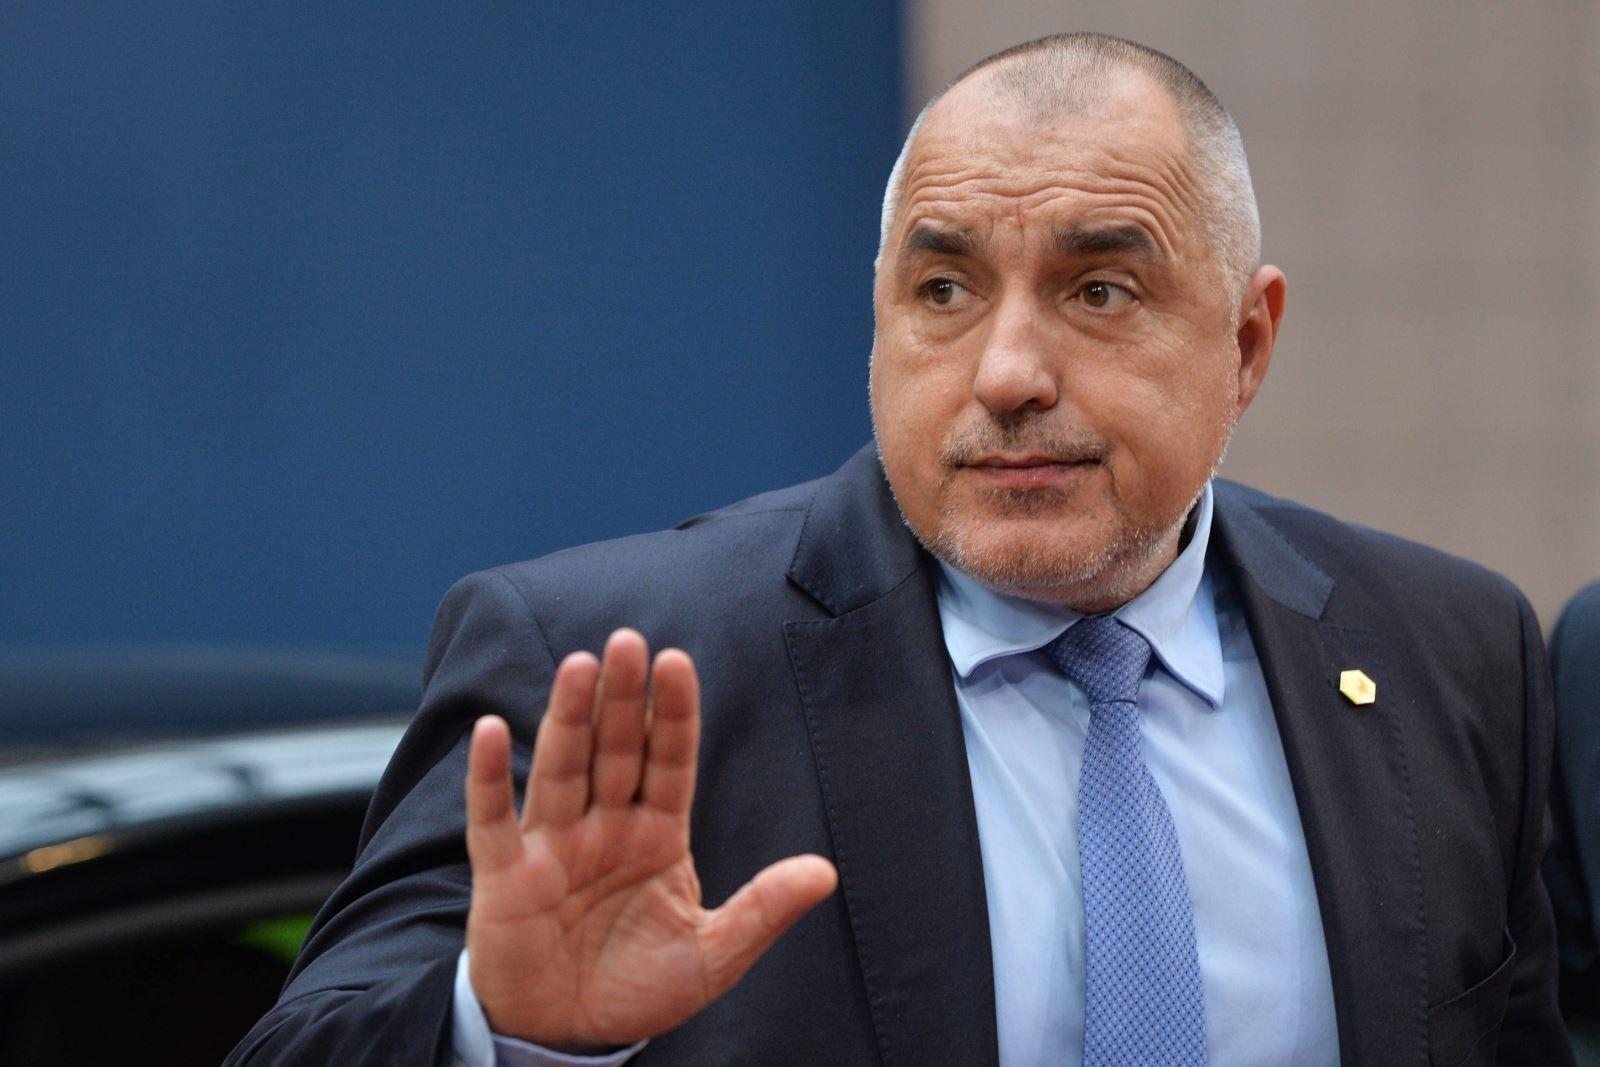 Борисов заплаши от Лондон: Ако патриотите и реформаторите не са стабилни – избори! - http://novinite.eu/borisov-zaplashi-ot-london-ako-patriotite-i-reformatorite-ne-sa-stabilni-izbori/